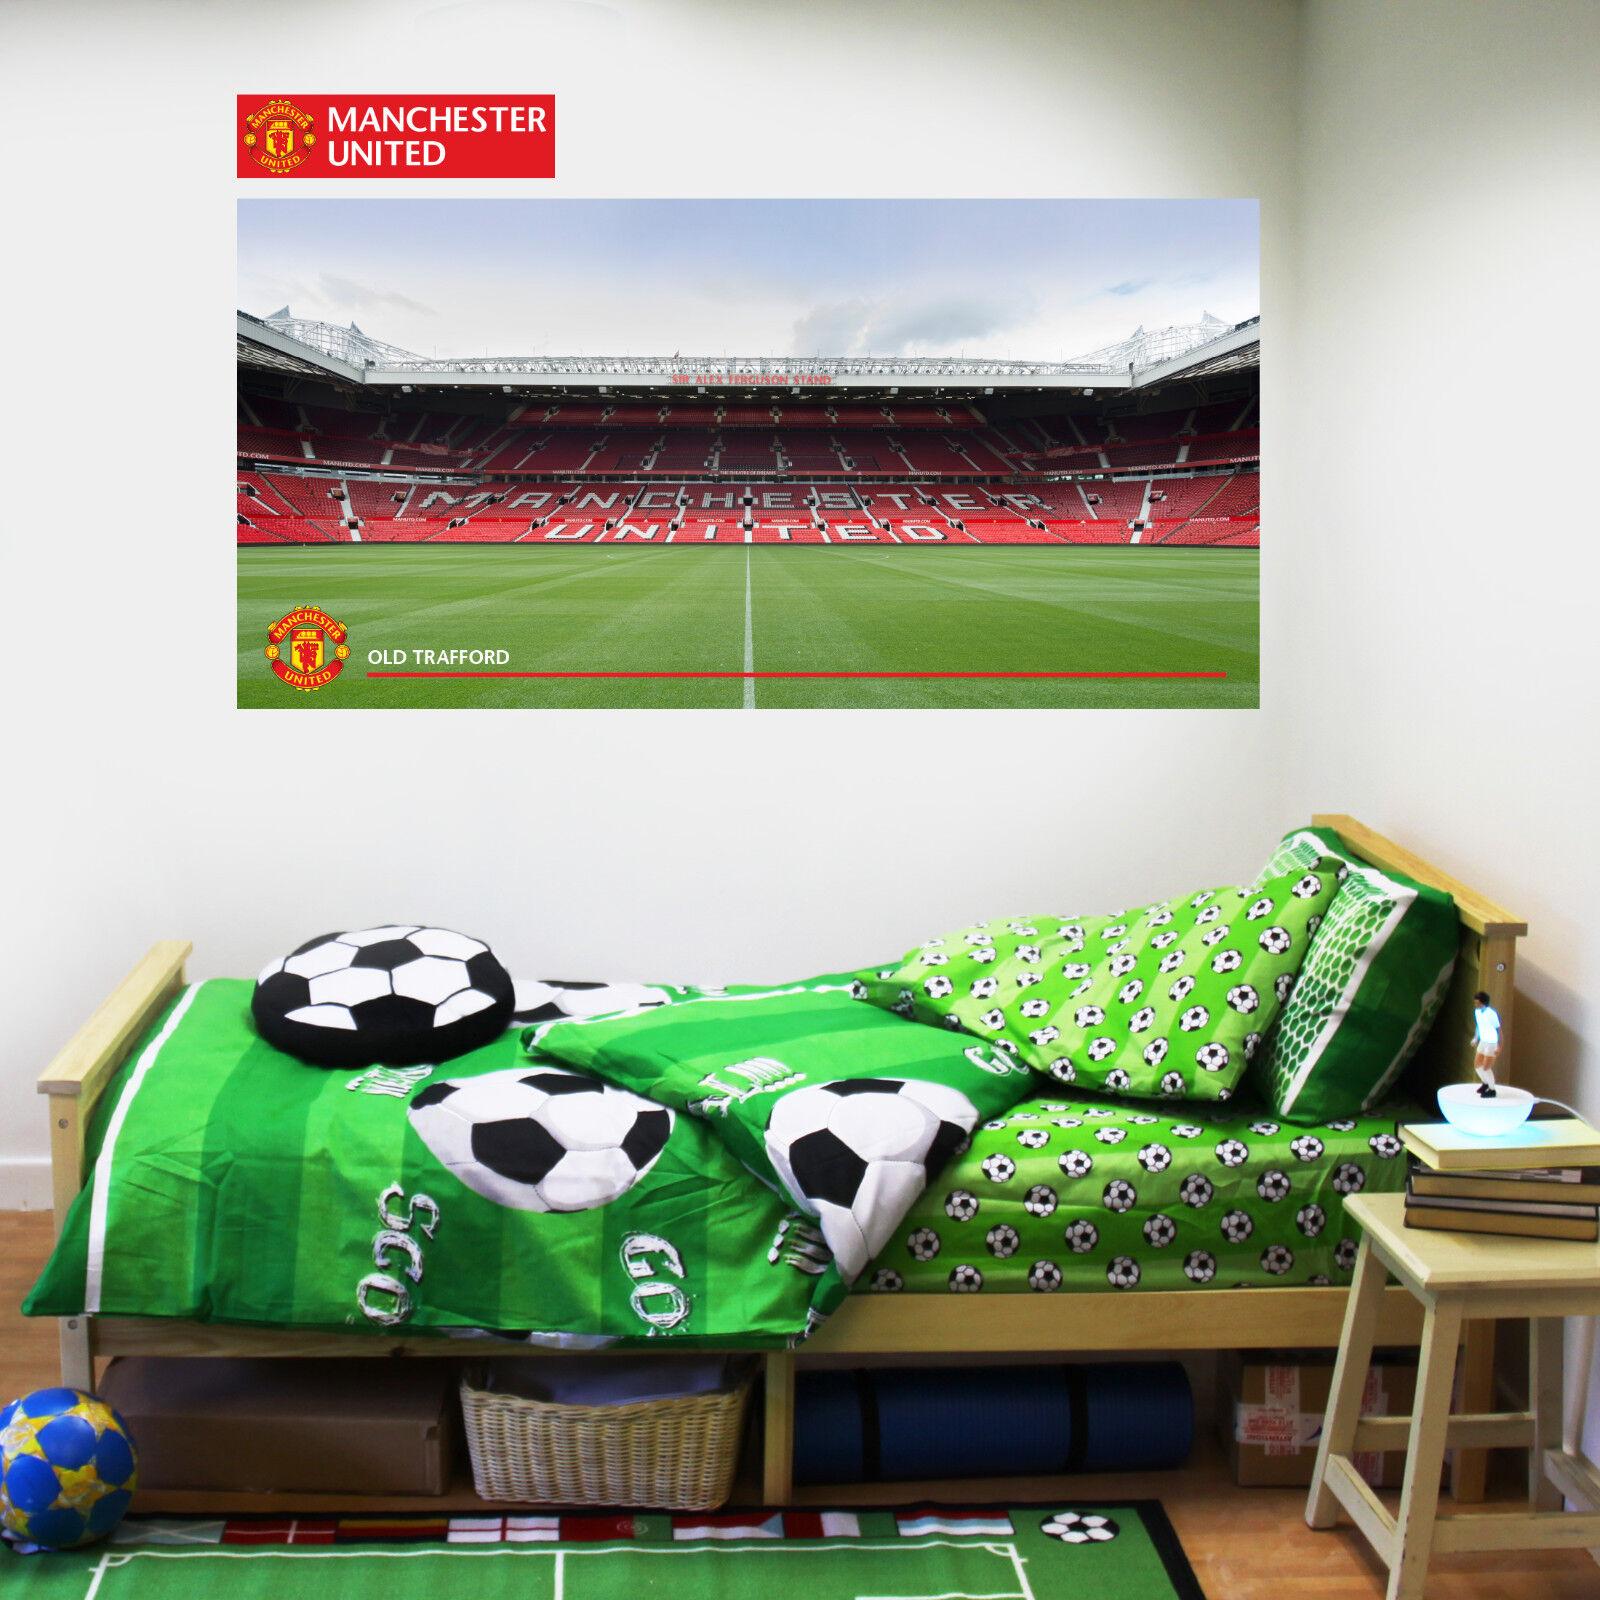 Femmechester United FC Old Trafford Stadium Autocollant Murale  Femme Art Utd Art Femme Decal Set 14d75c